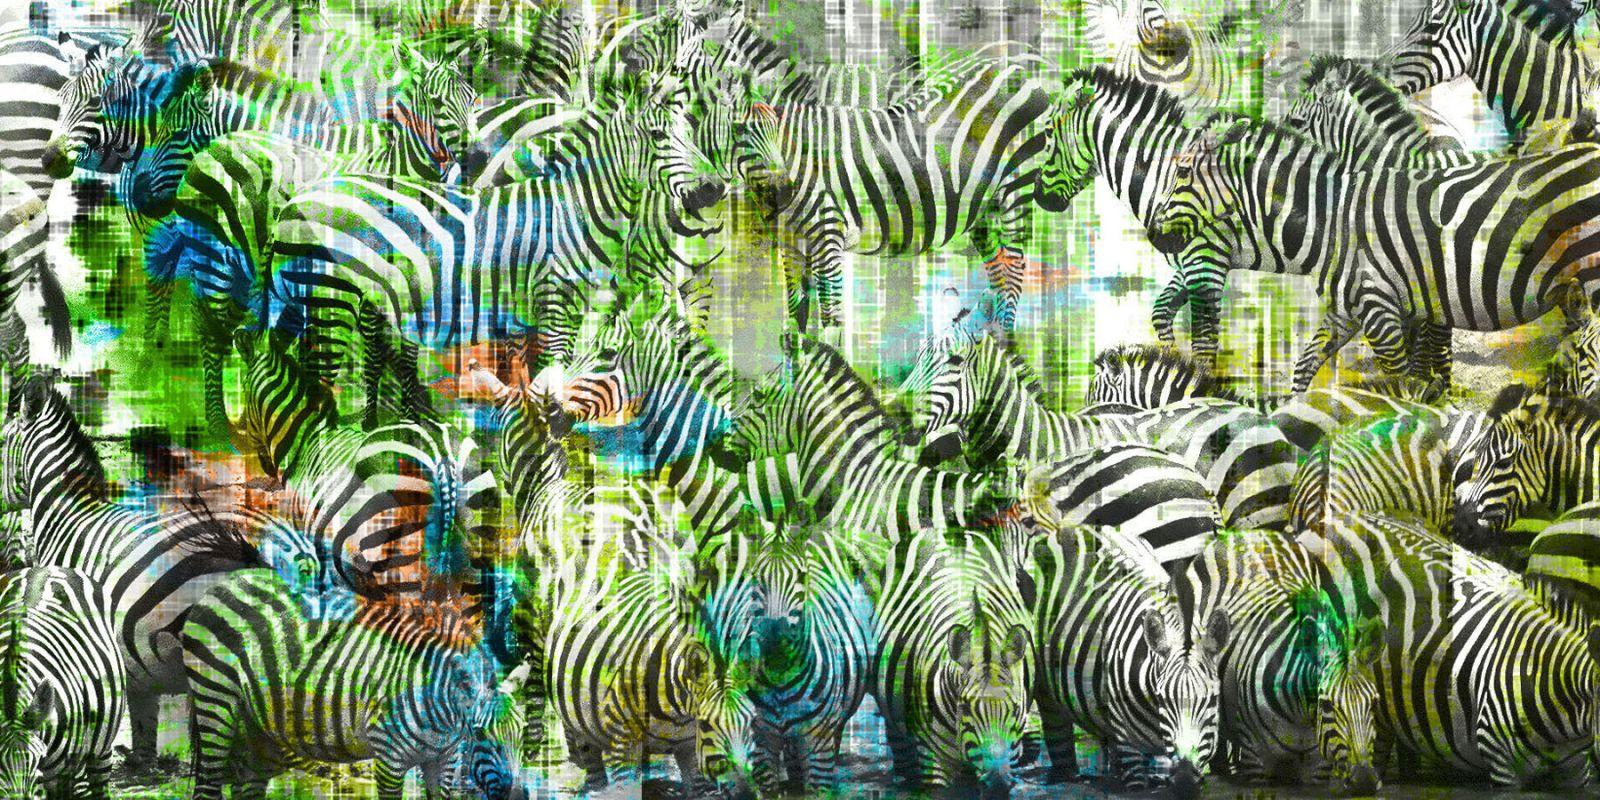 Parvez Taj Green Zebras Print on Canvas Art Print on Premium Canvas 30 Sale $238.08 ITEM: bci2770789 ID#:G41-71-C-60 UPC: 733520099697 :